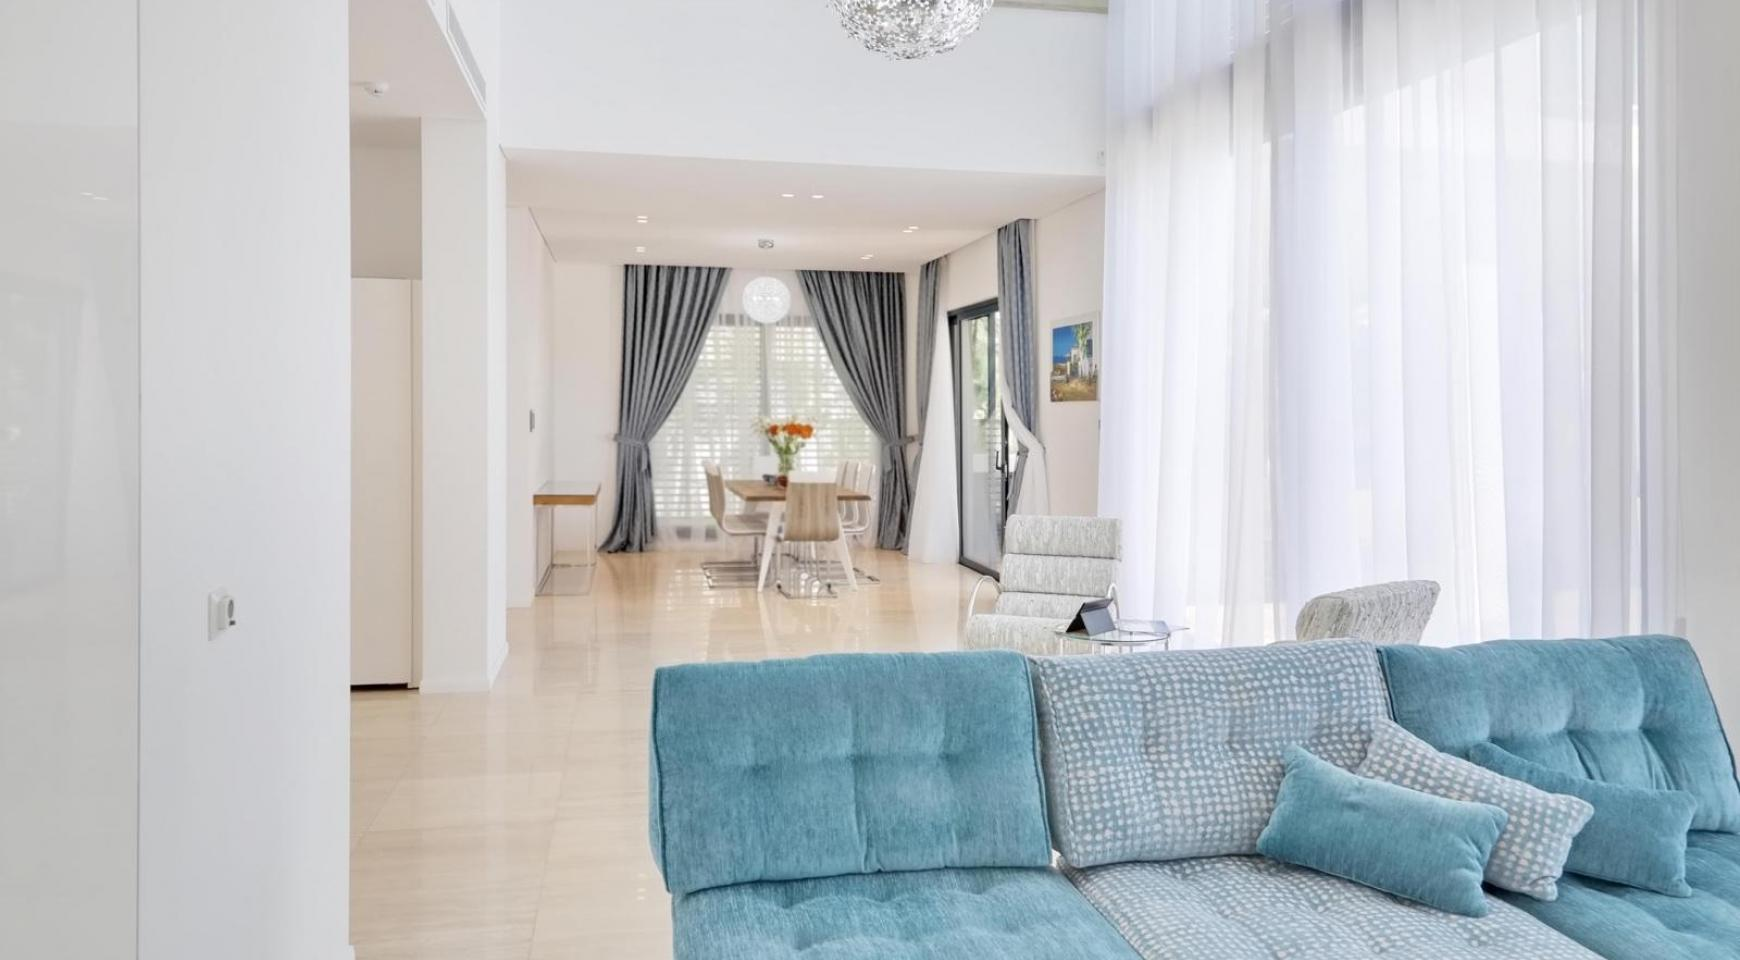 New Luxurious 4 Bedroom Villa in the Tourist Area - 13